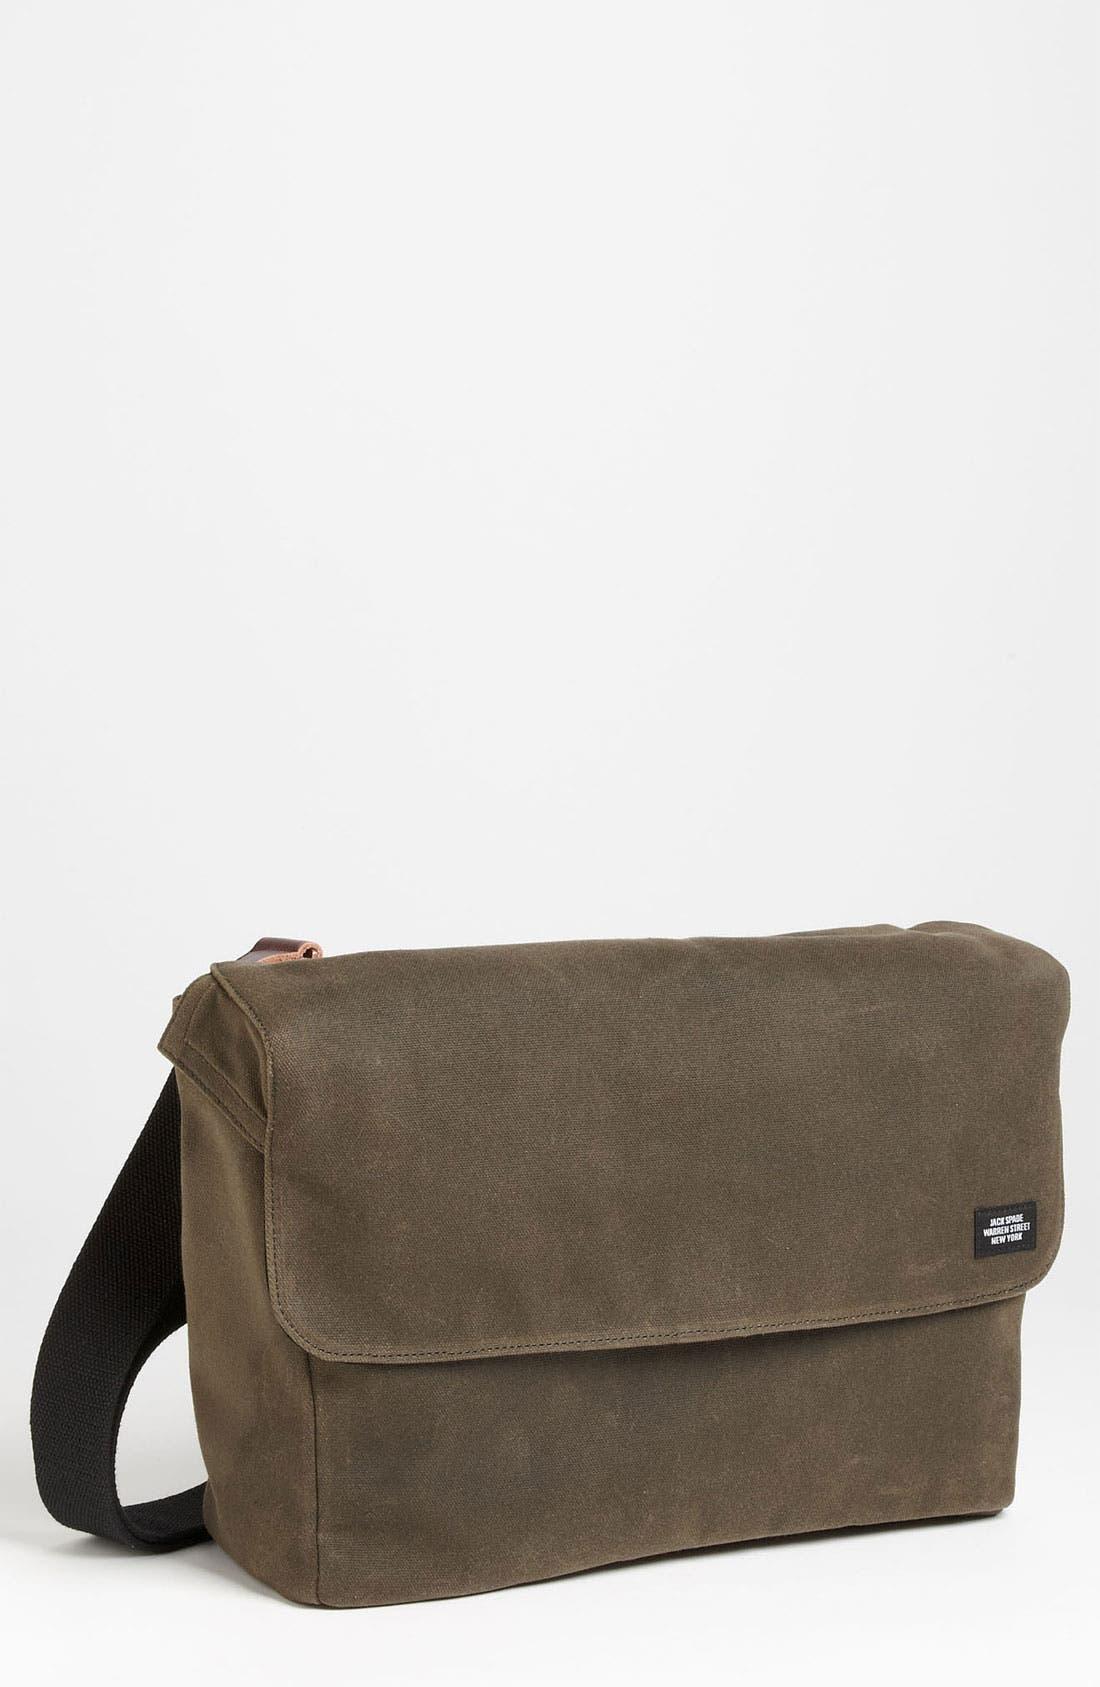 Alternate Image 1 Selected - Jack Spade 'Cap' Canvas Messenger Bag